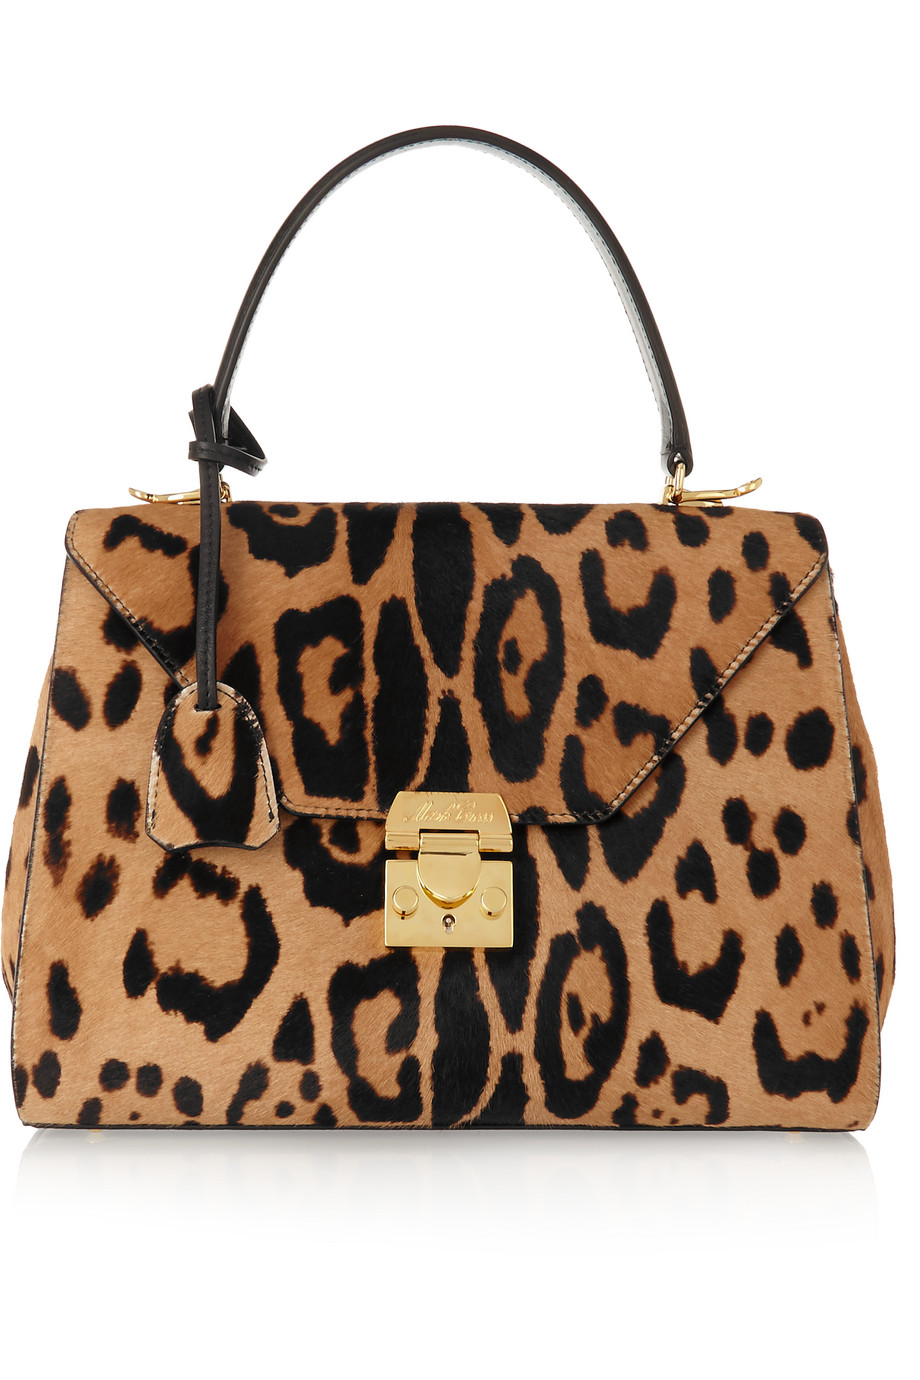 Mark Cross Hadley Small Leopard-Print Calf Hair Shoulder Bag, Leopard Print, Women's